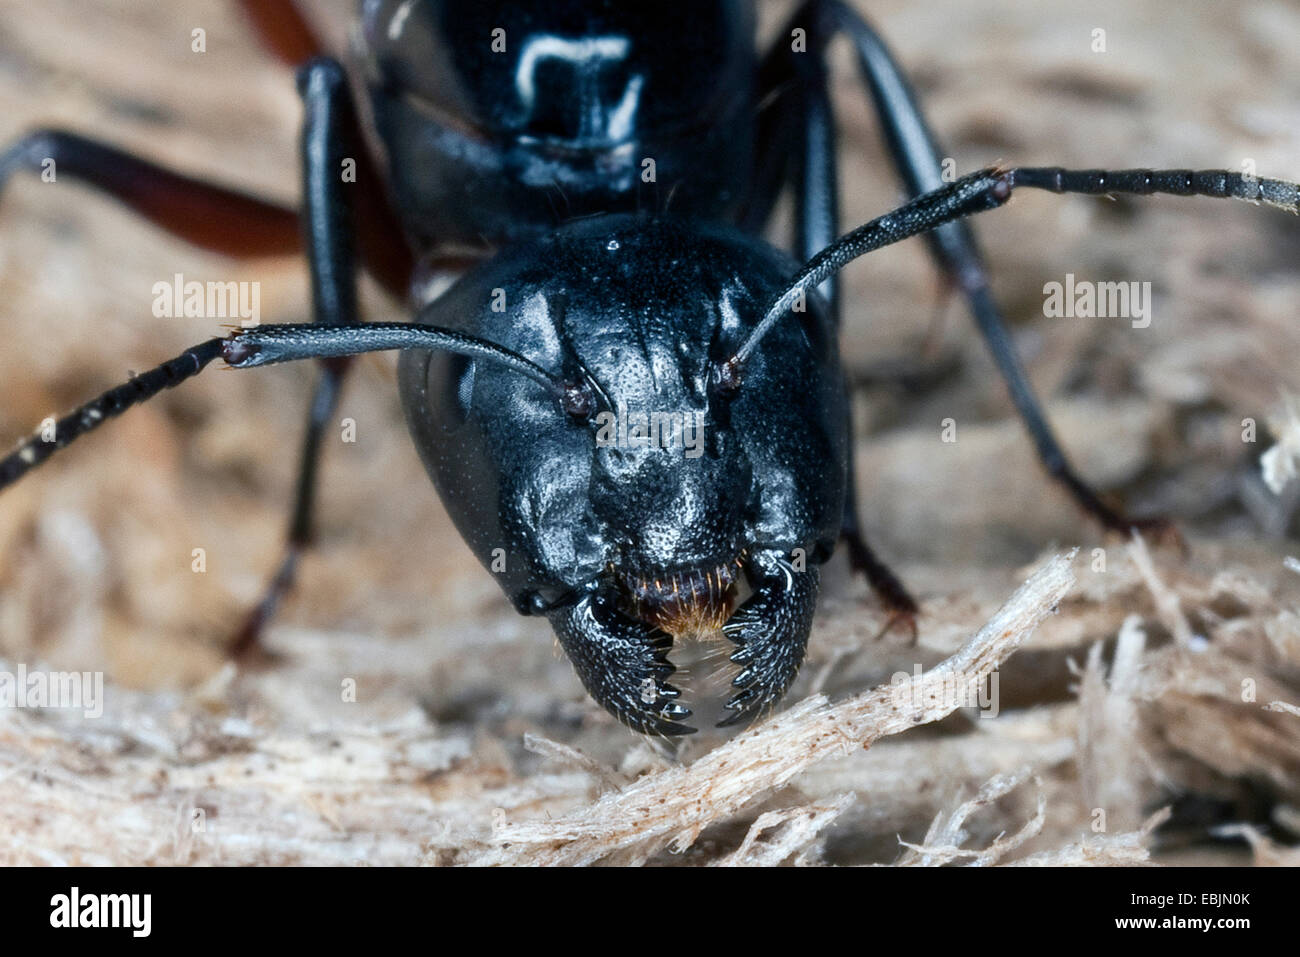 Carpenter ant (siendo Camponotus ligniperdus, siendo Camponotus ligniperda), reina alimentándose de madera podrida, Alemania Foto de stock